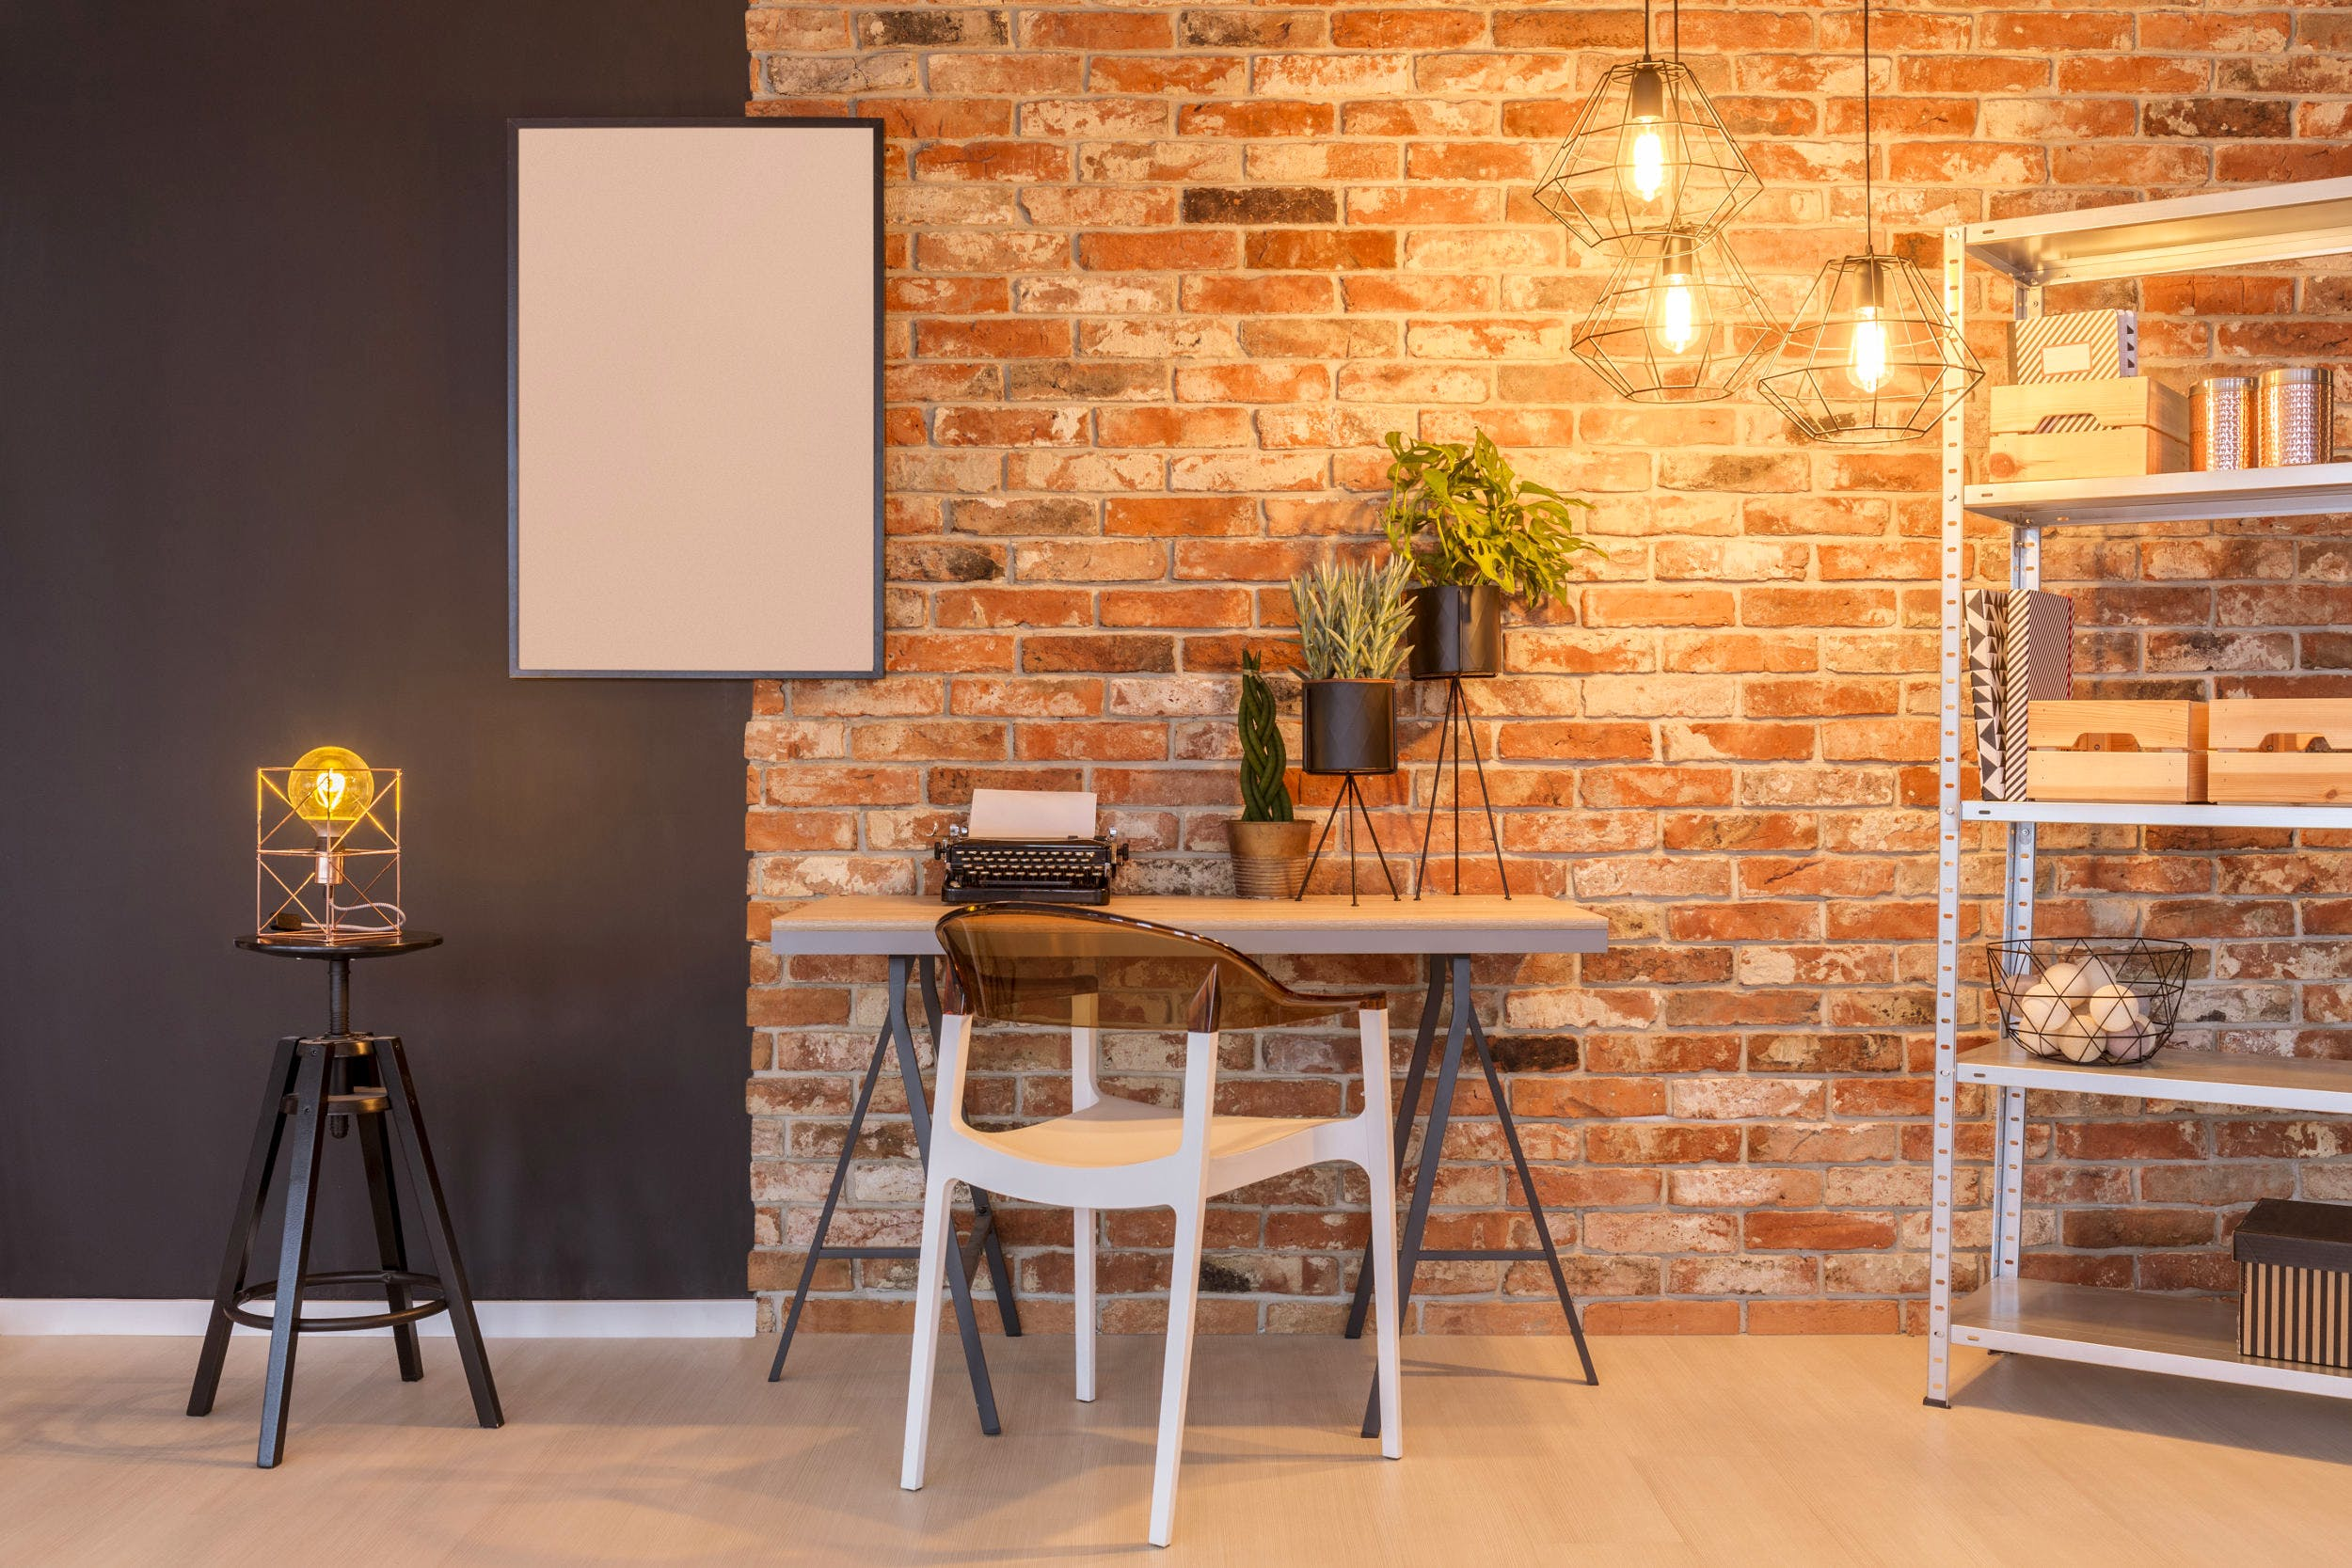 Image of shutterstock 6385822118 2 in Industrial style in interior design - Cosentino